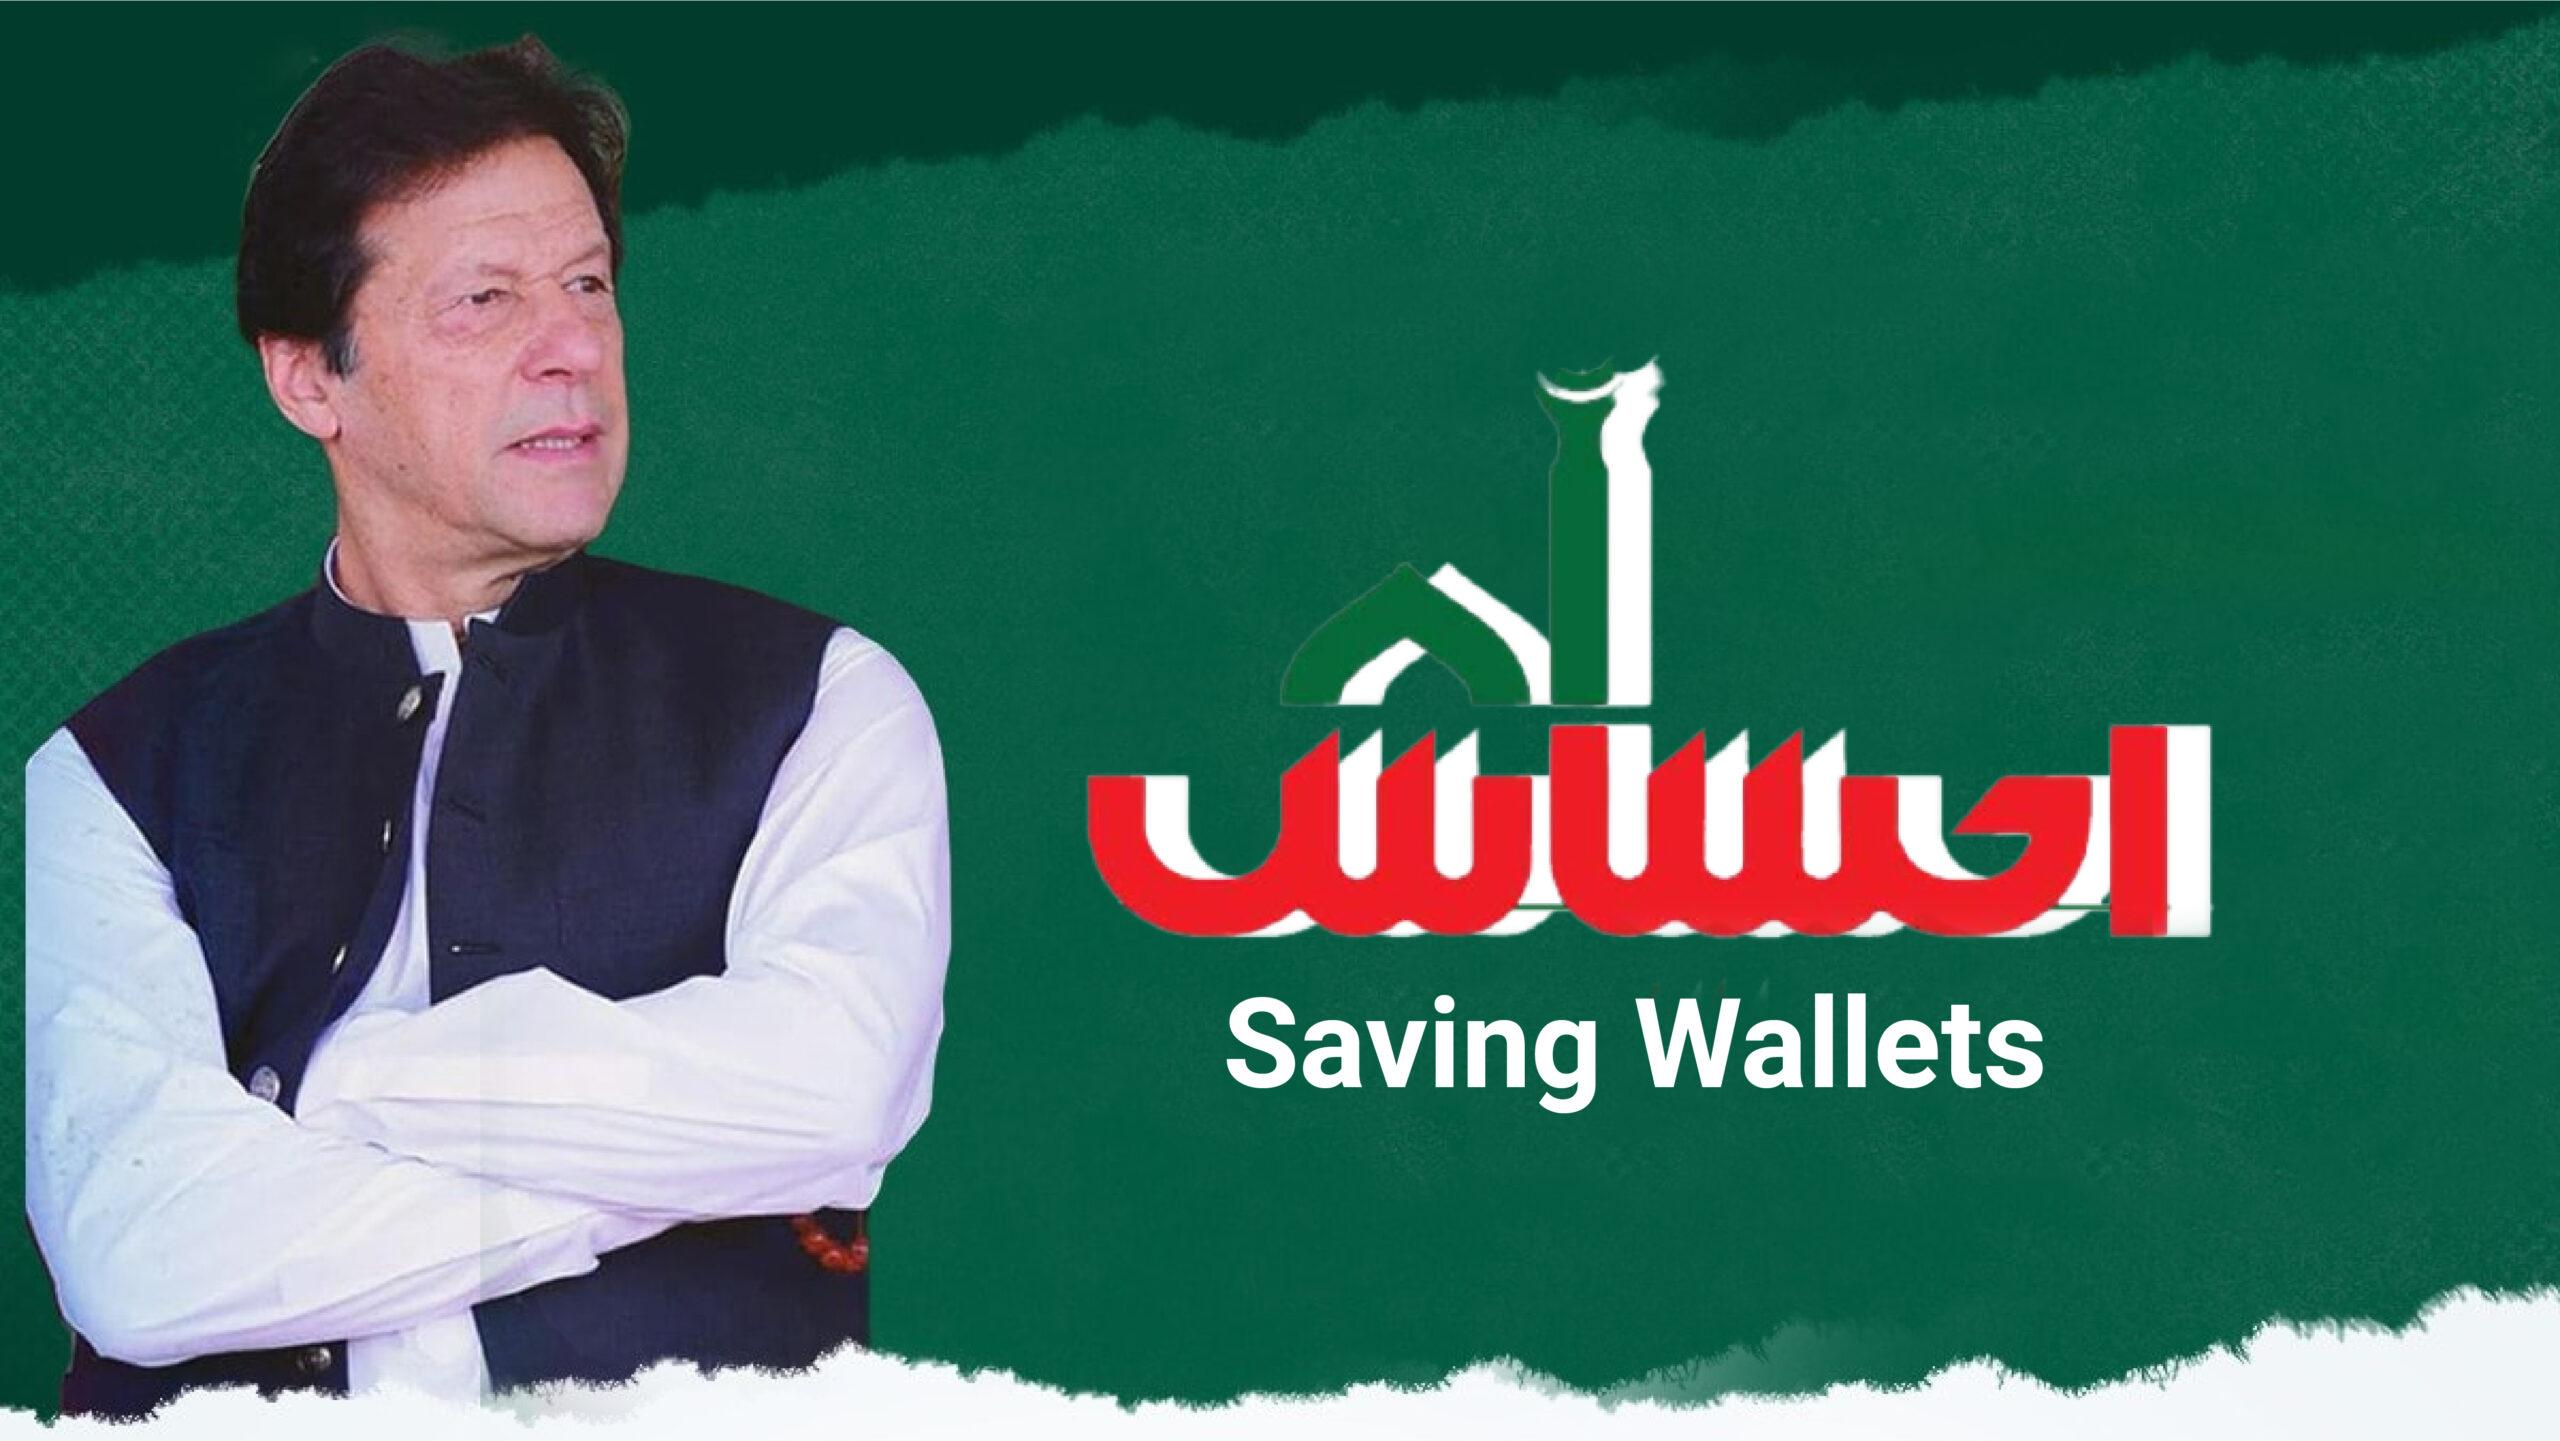 PM inaugurates Ehsaas Saving Wallets scheme